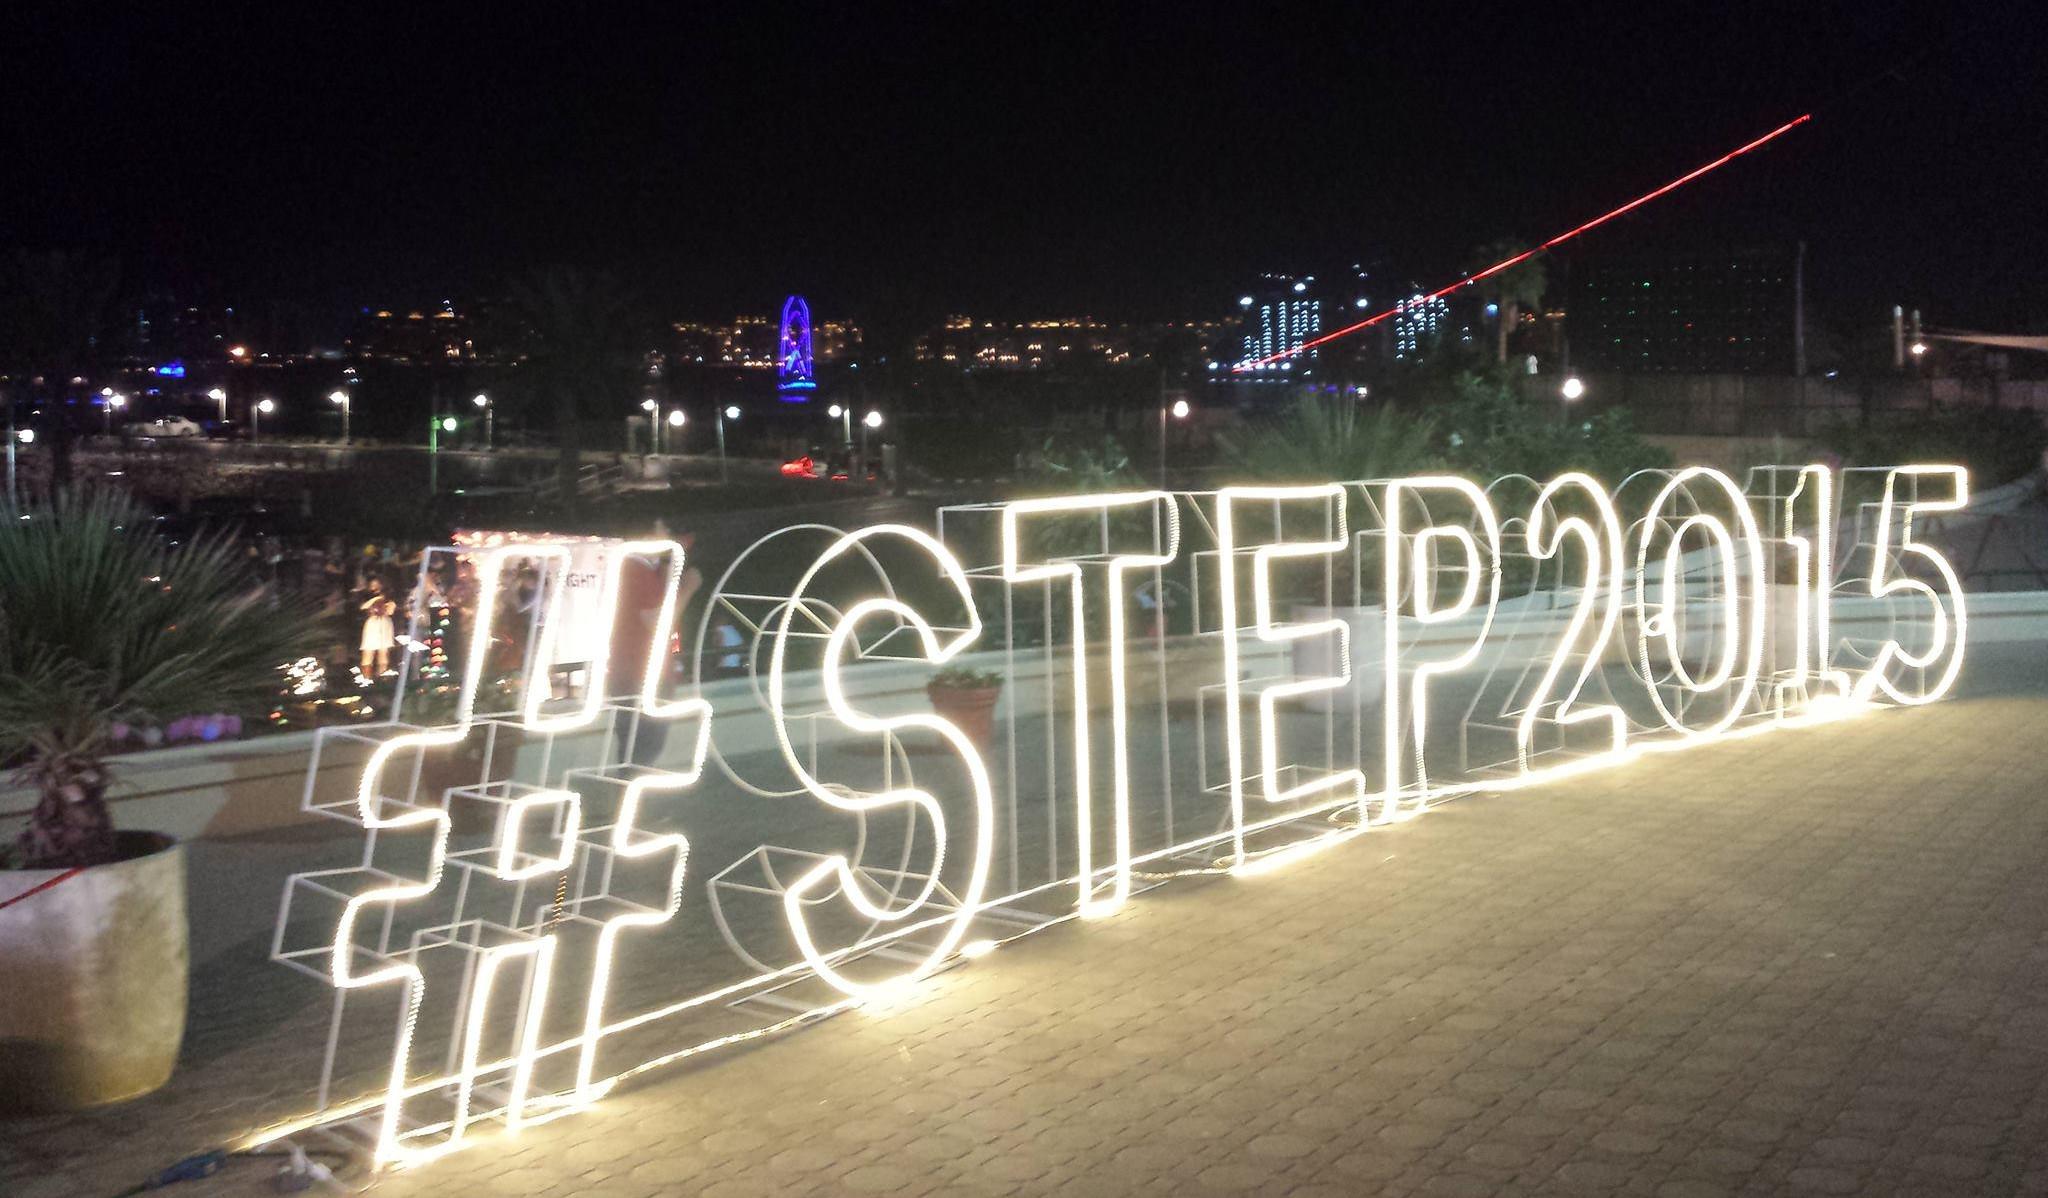 STEP 2015